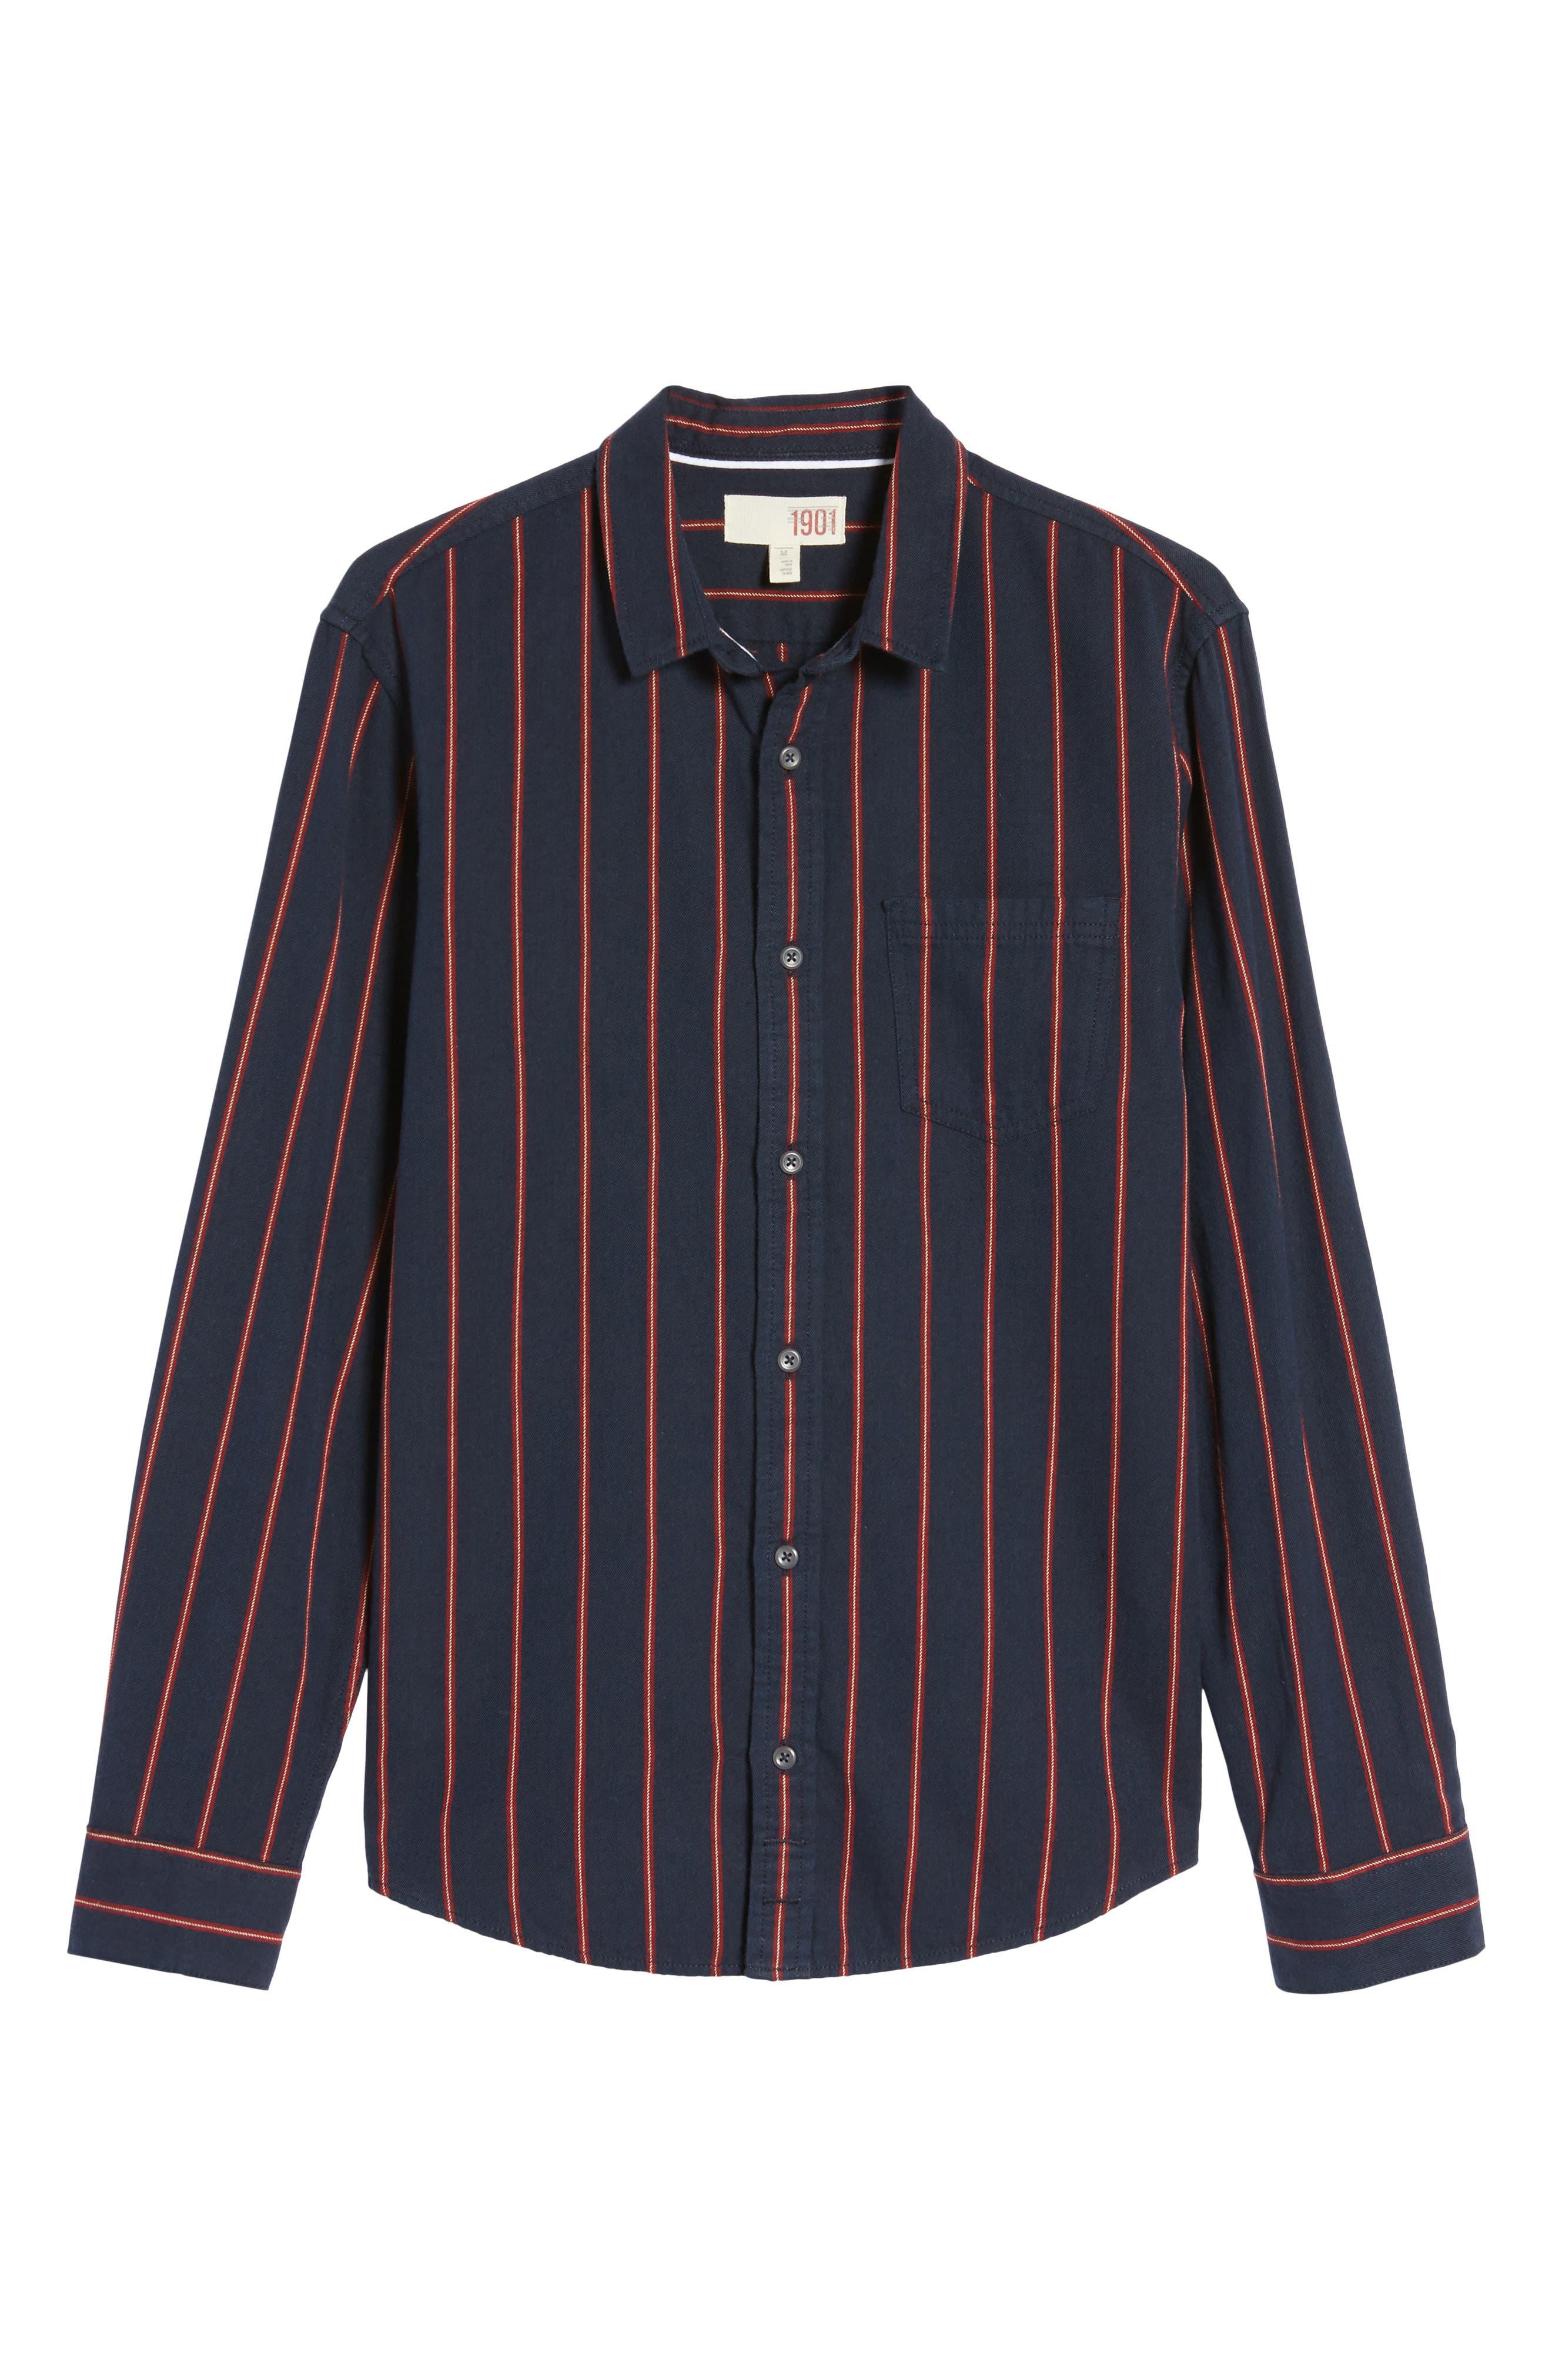 The Rail Long Sleeve Twill Shirt,                             Alternate thumbnail 6, color,                             Navy Peacoat Red Stripe